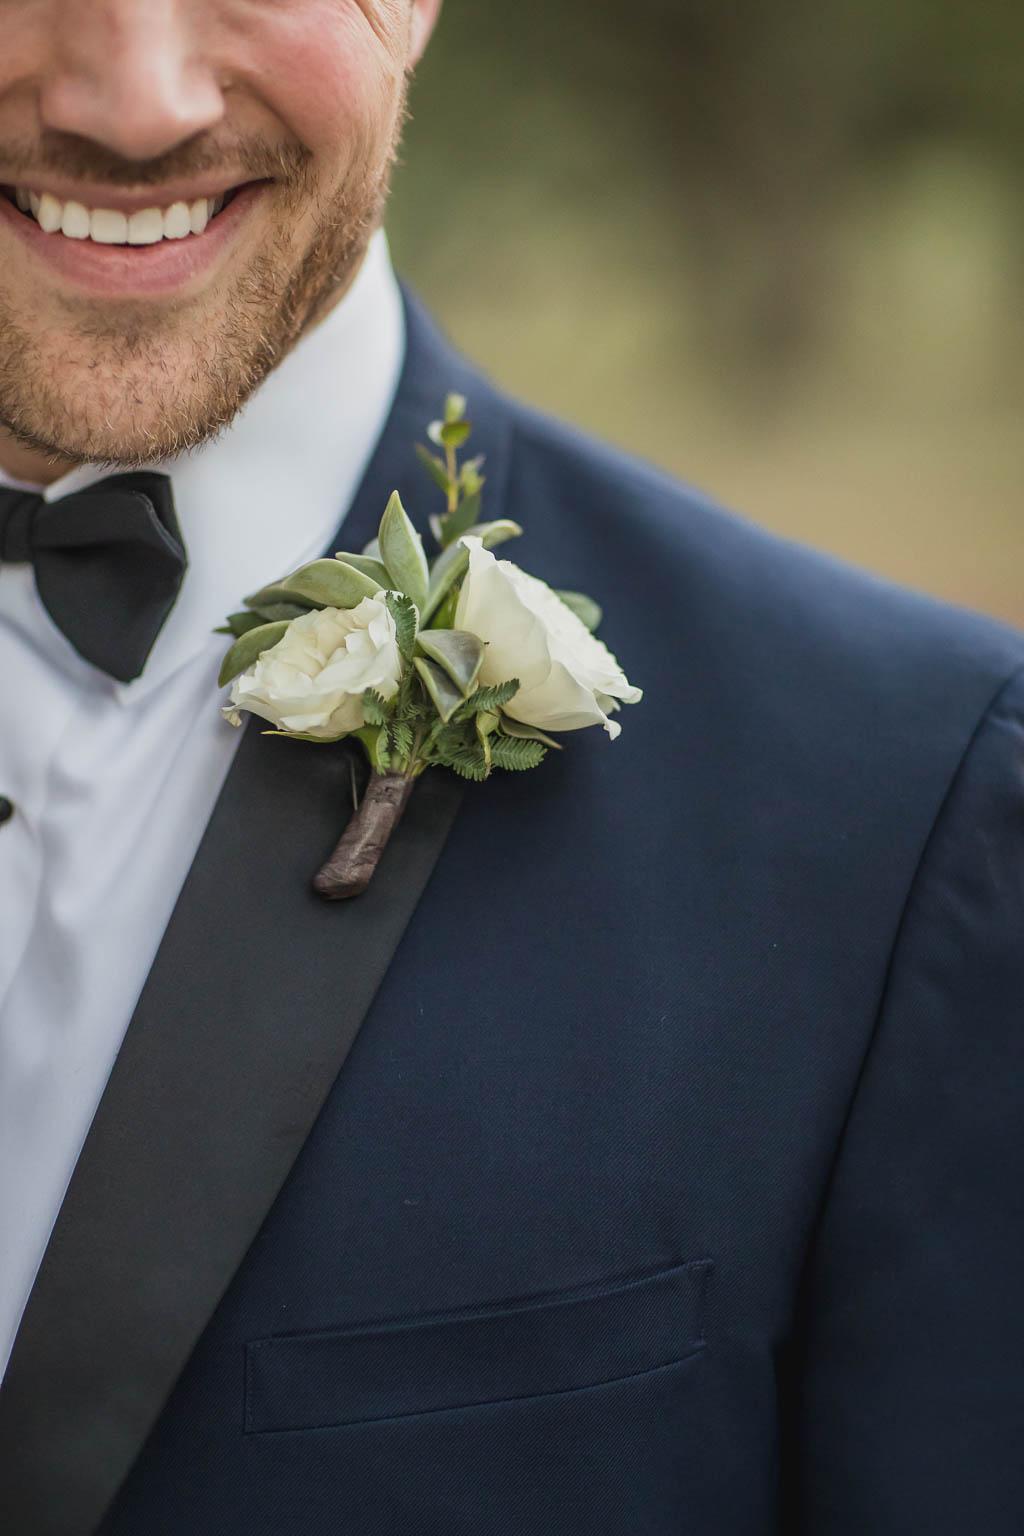 Groom Wedding Style - Bride Film